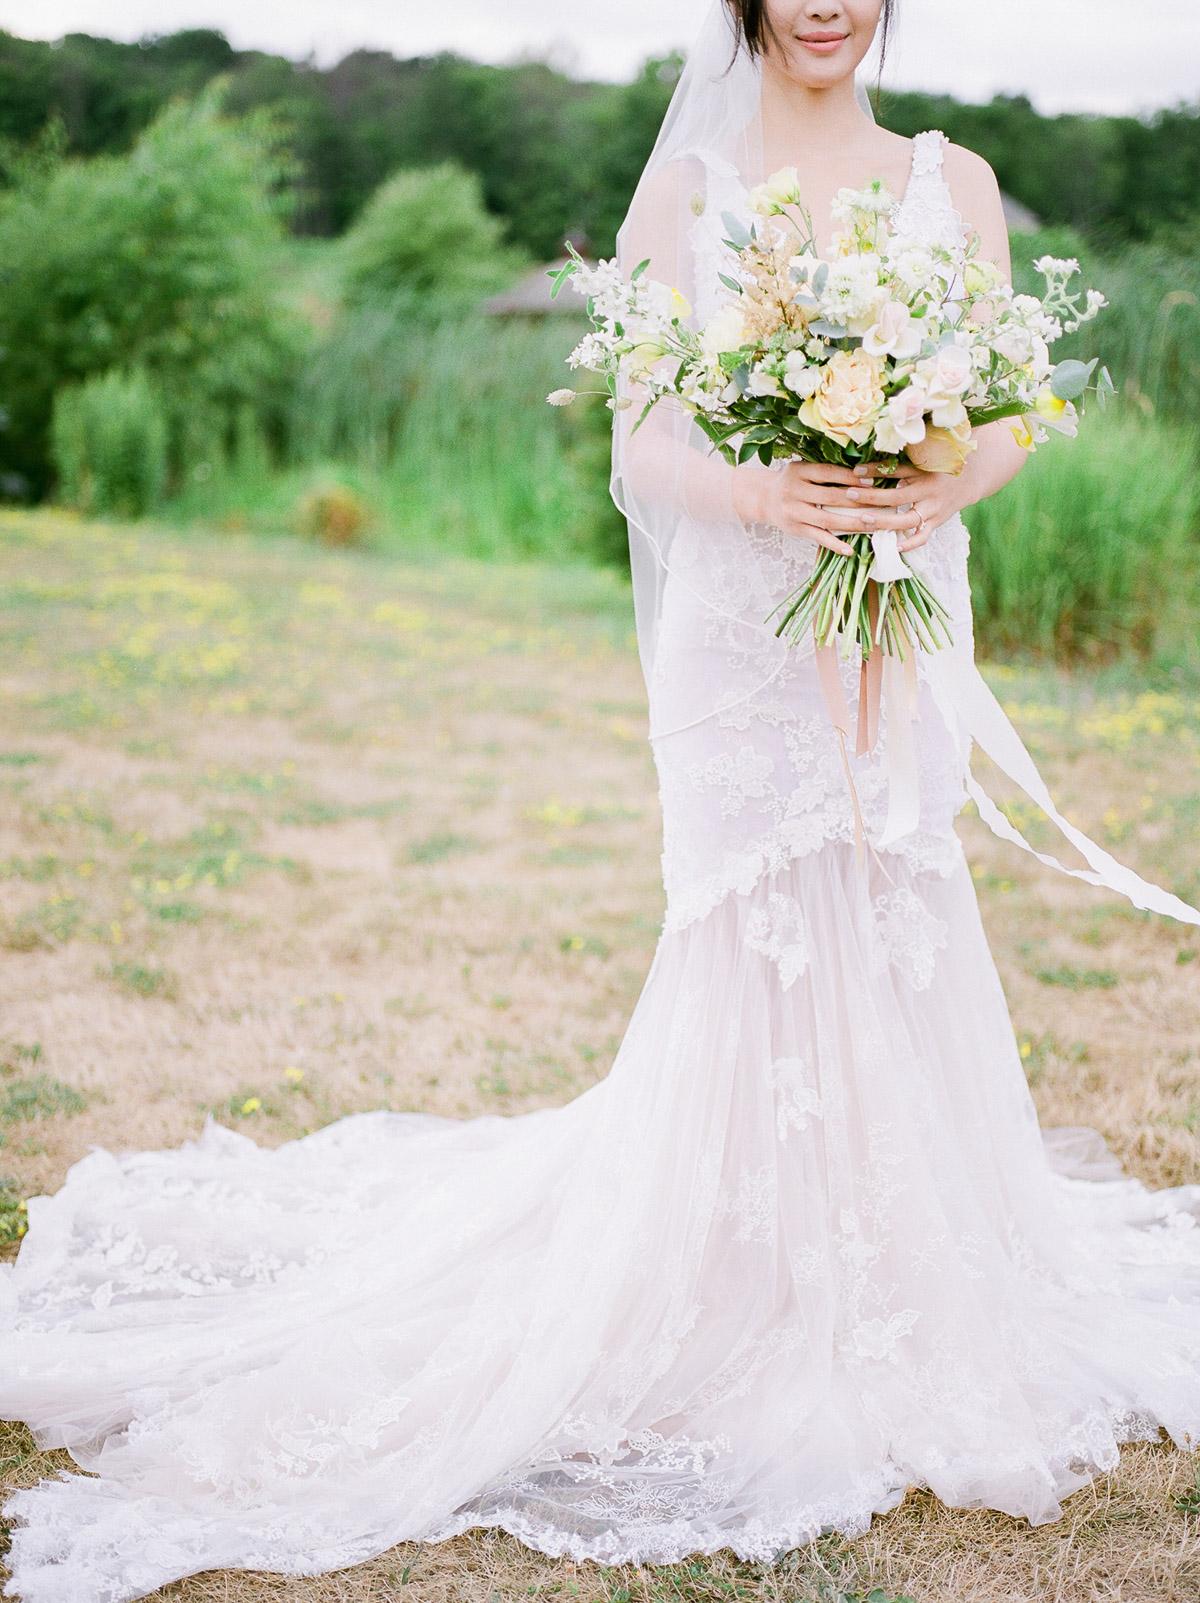 jennifer-xu-photography-vineyard-bride-swish-list-rosewod-eatstes-winery-beamsville-wedding-editorial-33.jpg